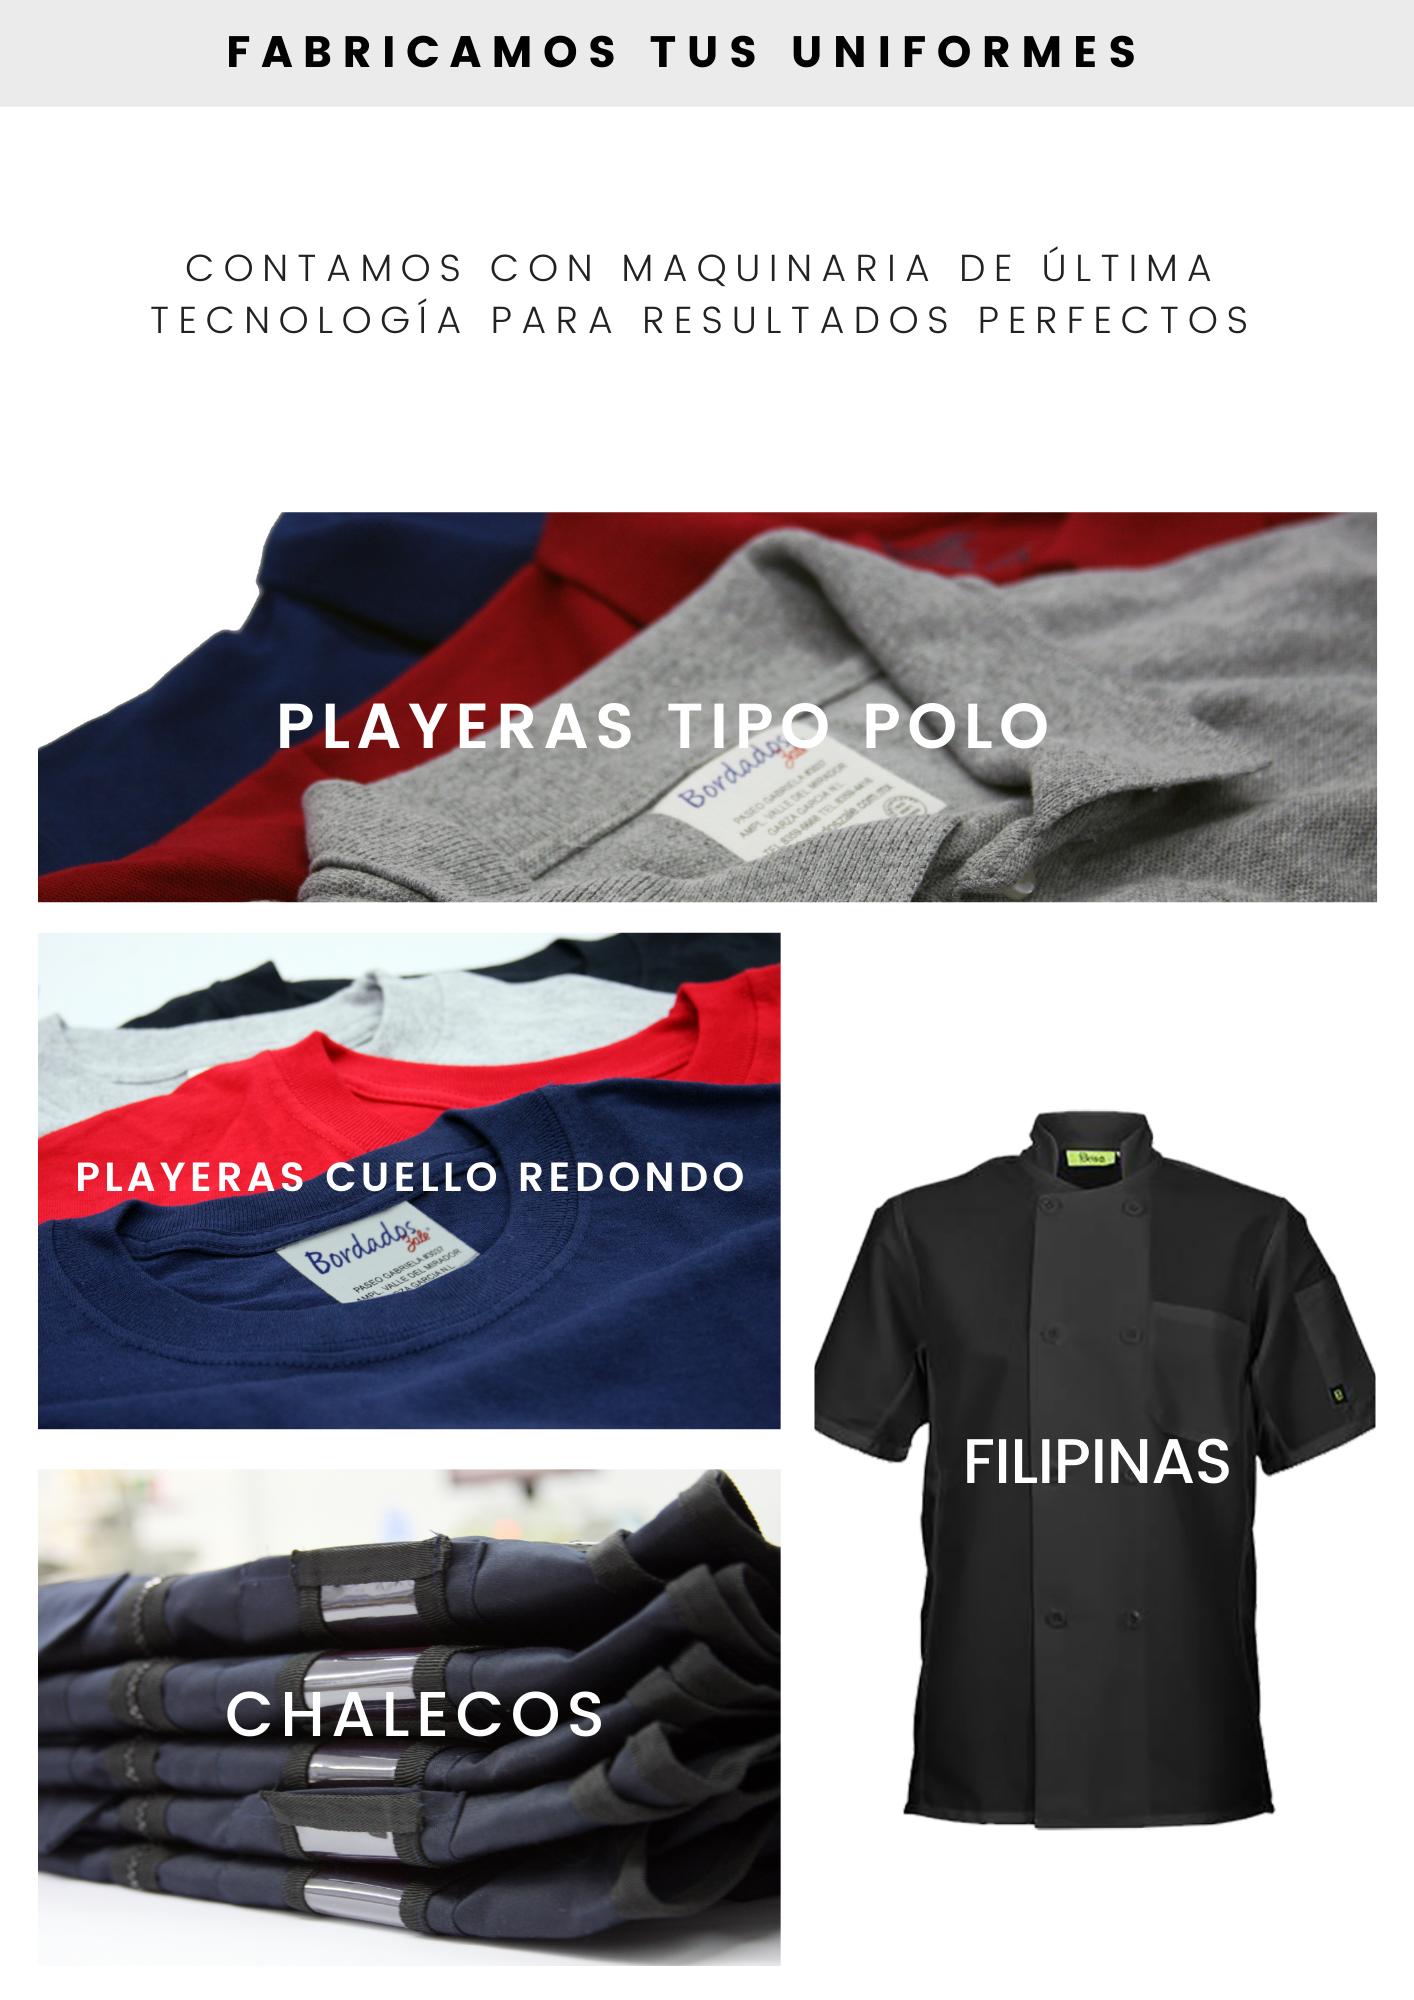 Fabricamos tus uniformes